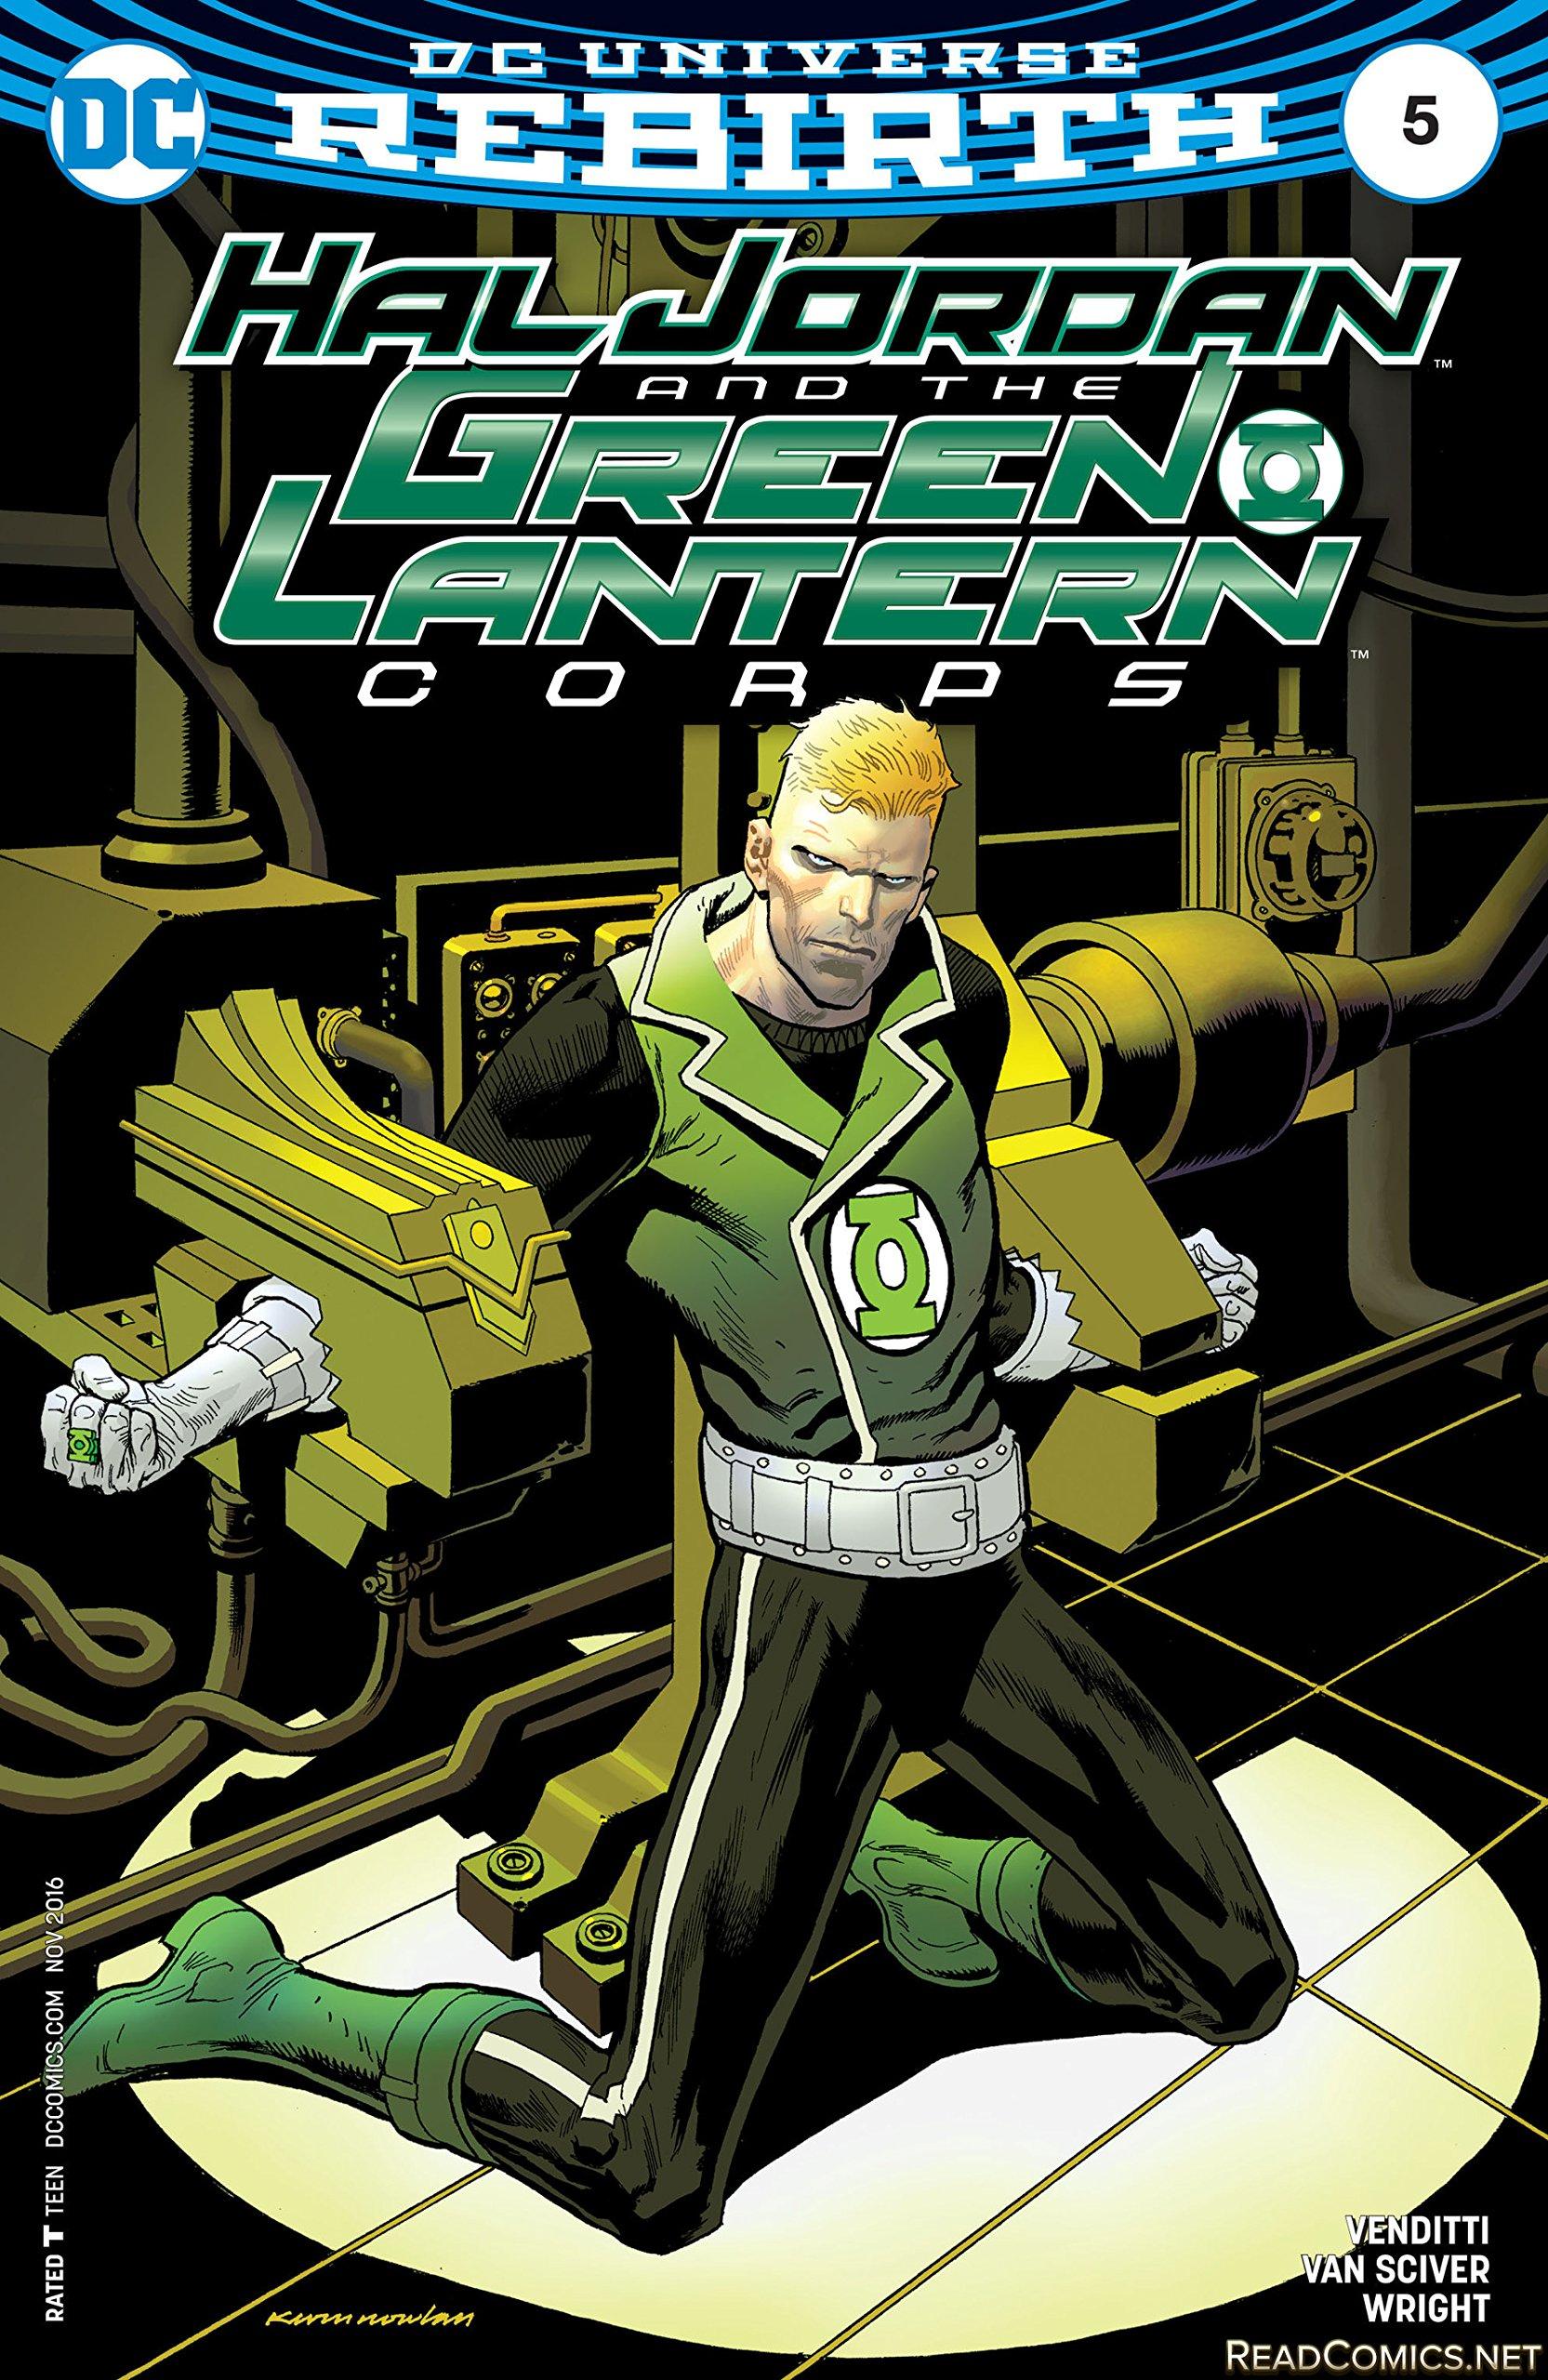 Read Online Hal Jordan and The Green Lantern Corps #5 Var Ed pdf epub